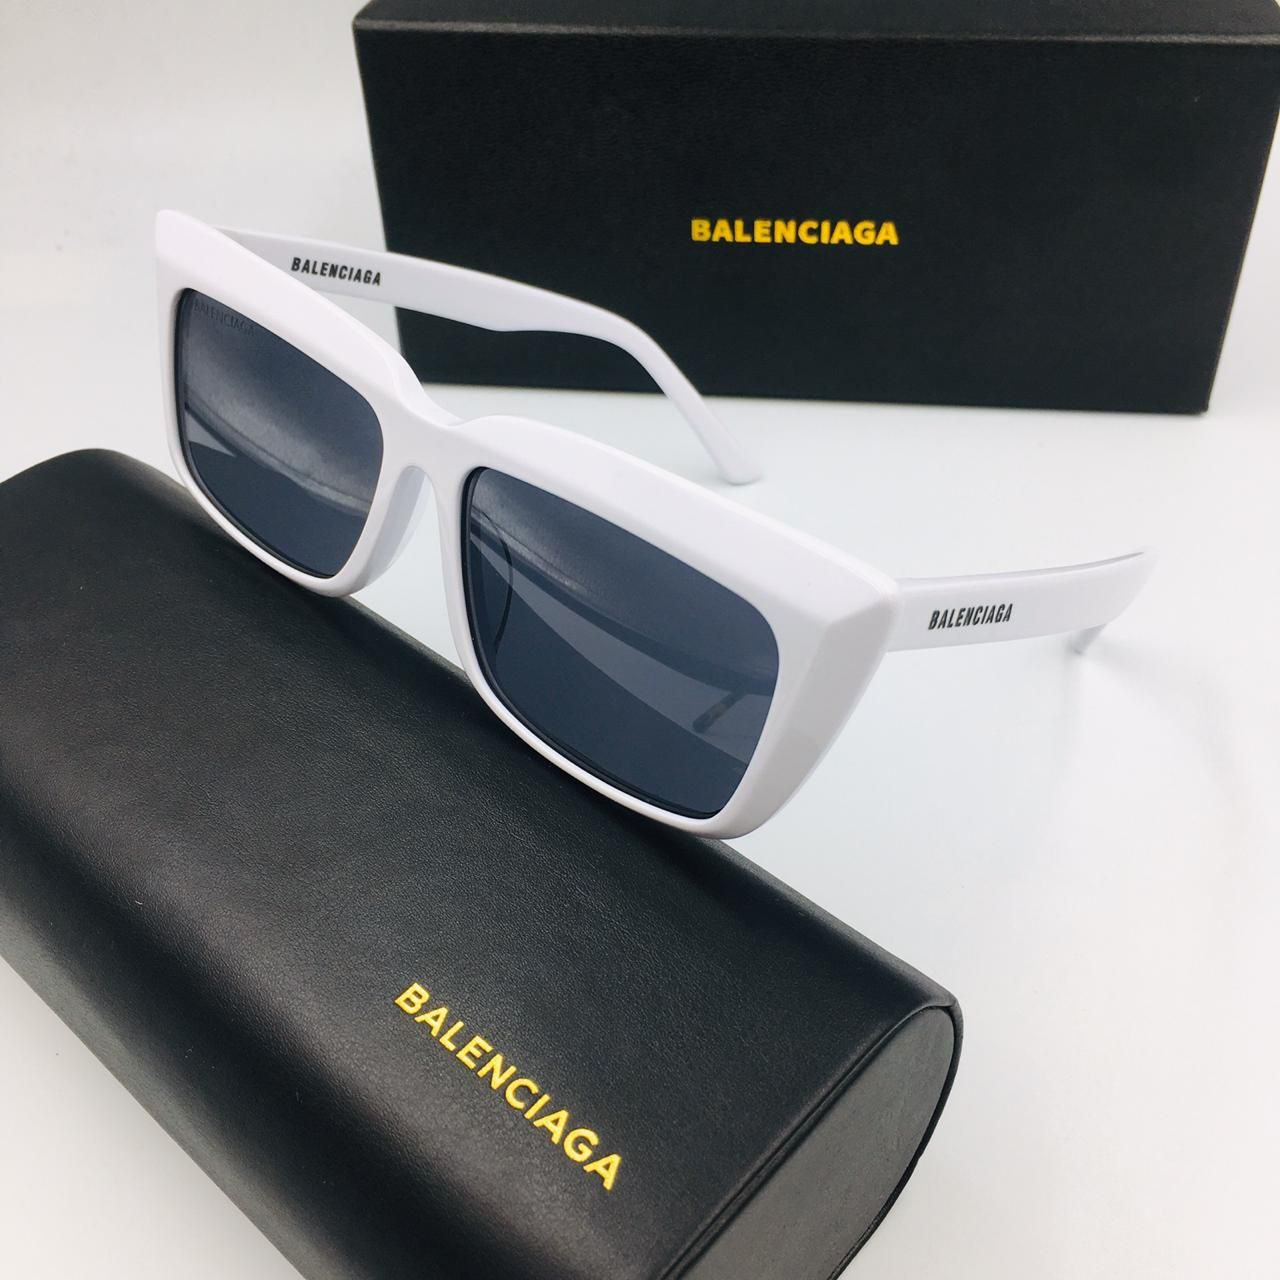 Pin By Vivisakellariadi On Sunglasses In 2020 Sunglasses Women Sunglasses Glasses